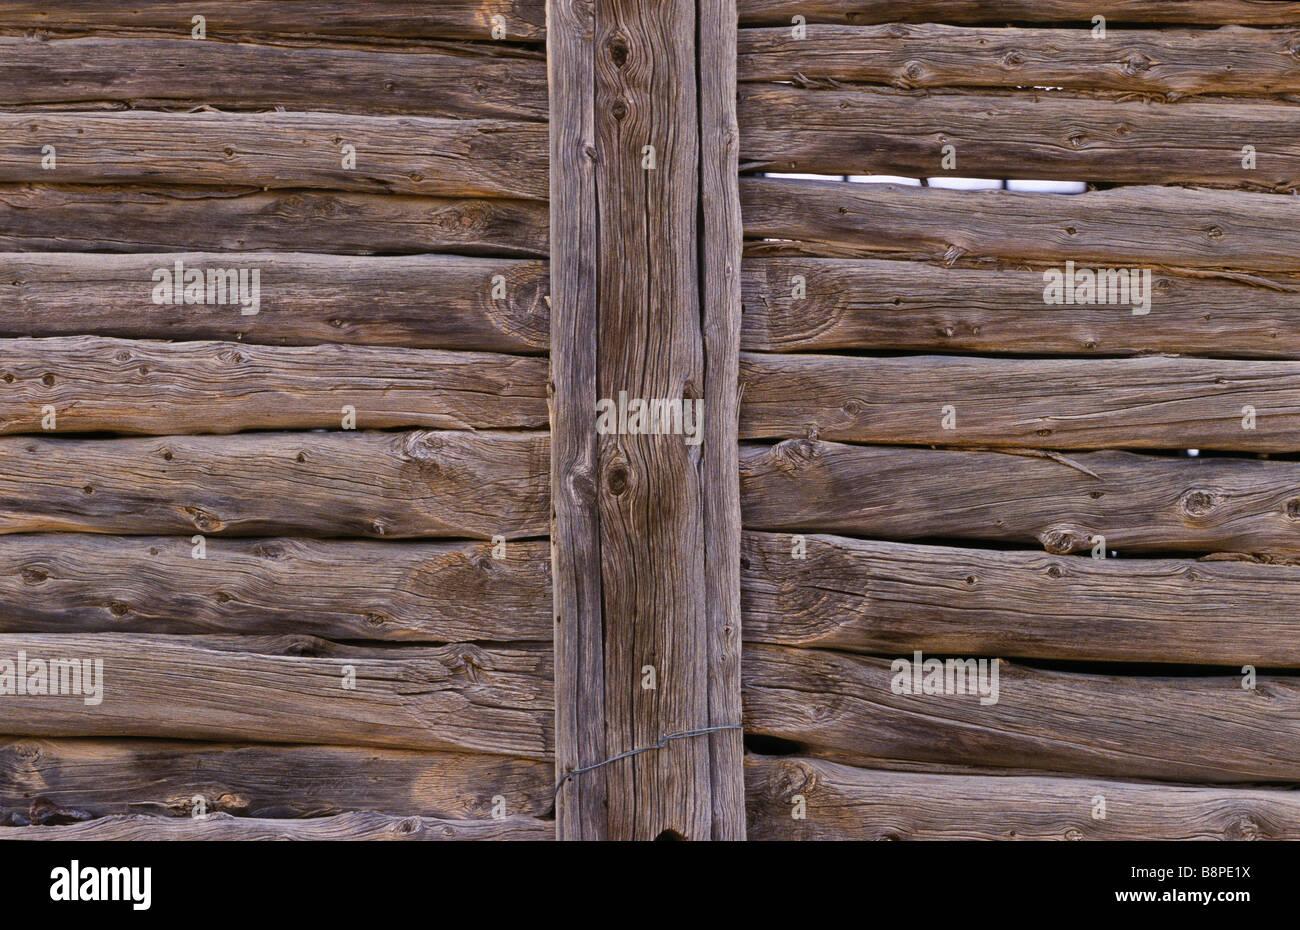 Drop-log costruzione di parete, outback Australia Immagini Stock